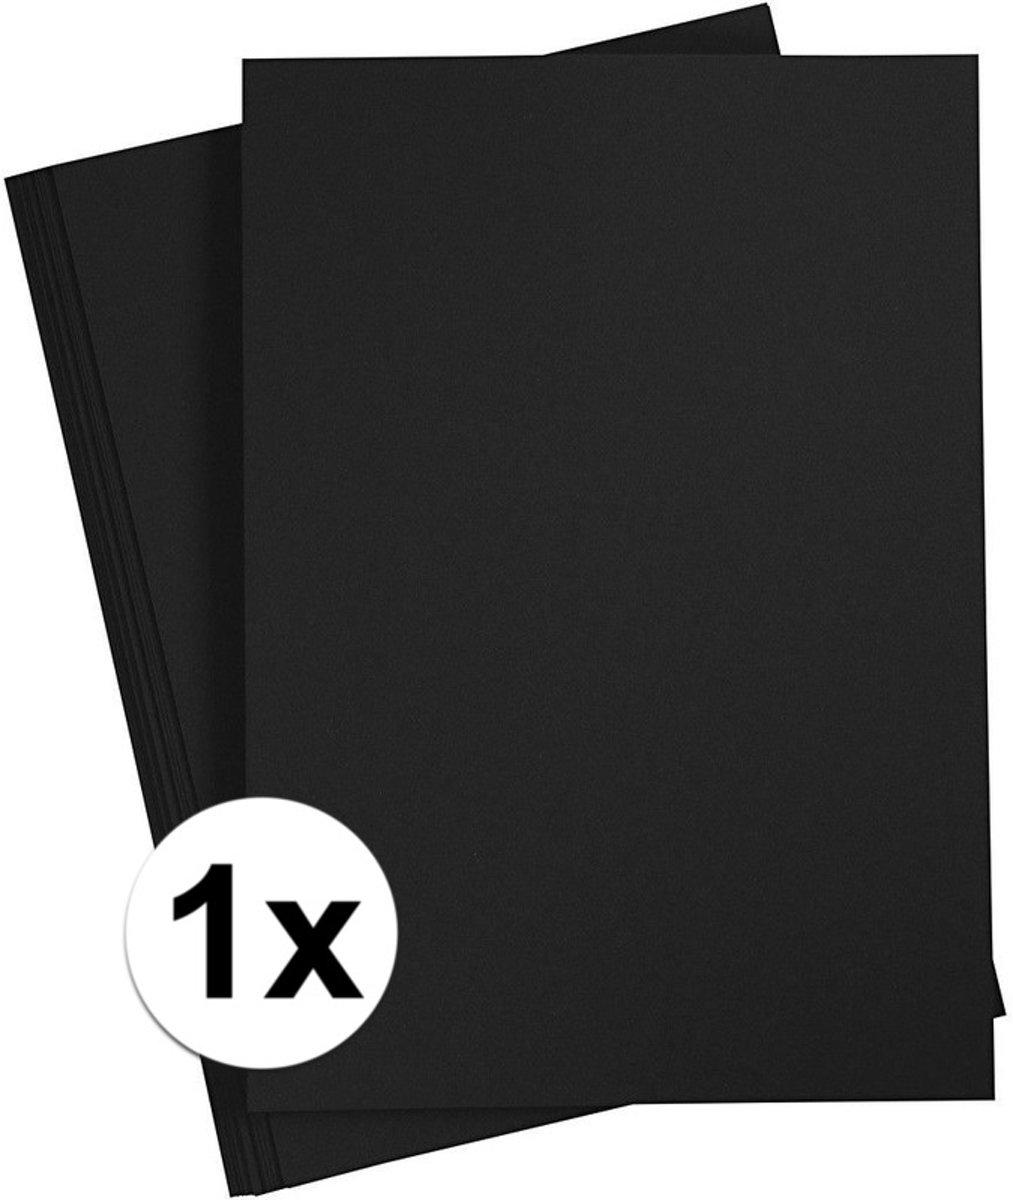 Zwart A4 vel 180 grams - hobby karton kopen